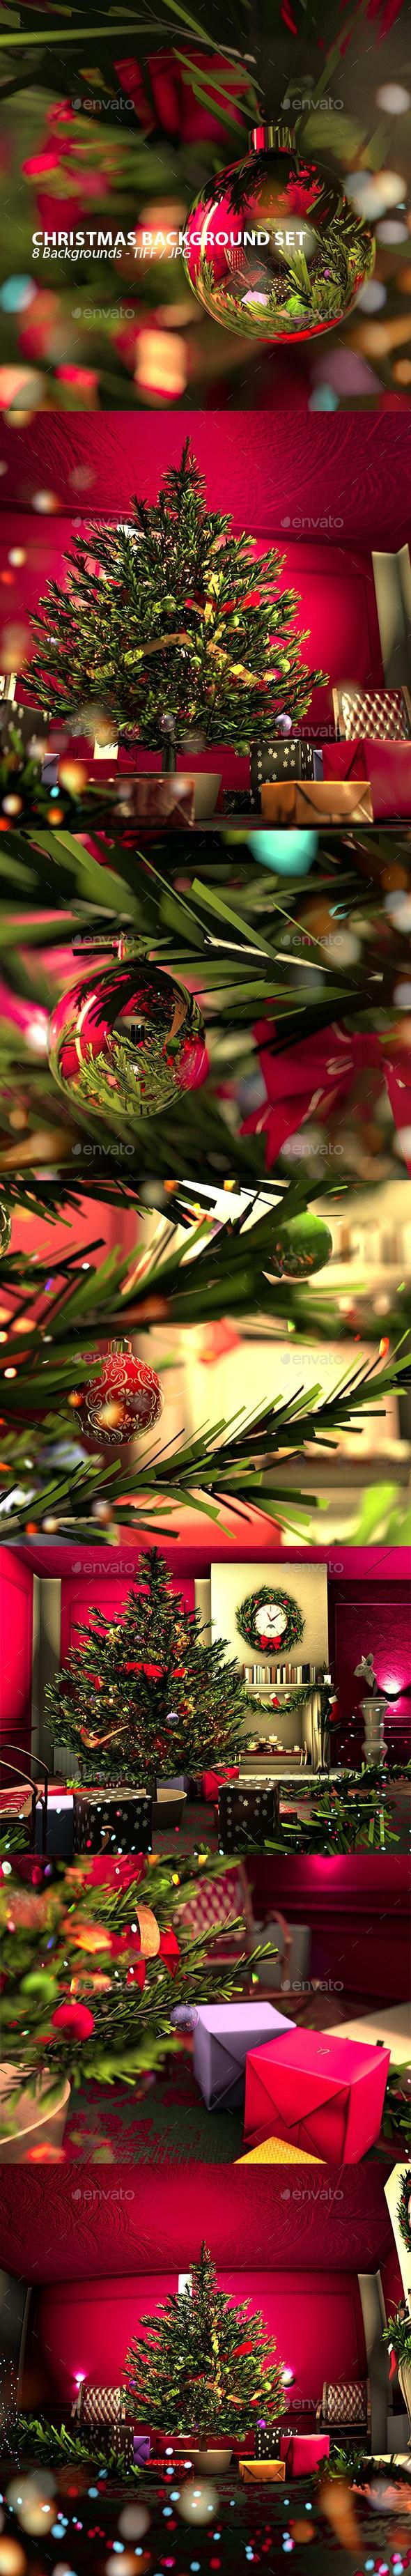 Christmas Spirit Background Set - 3D Backgrounds